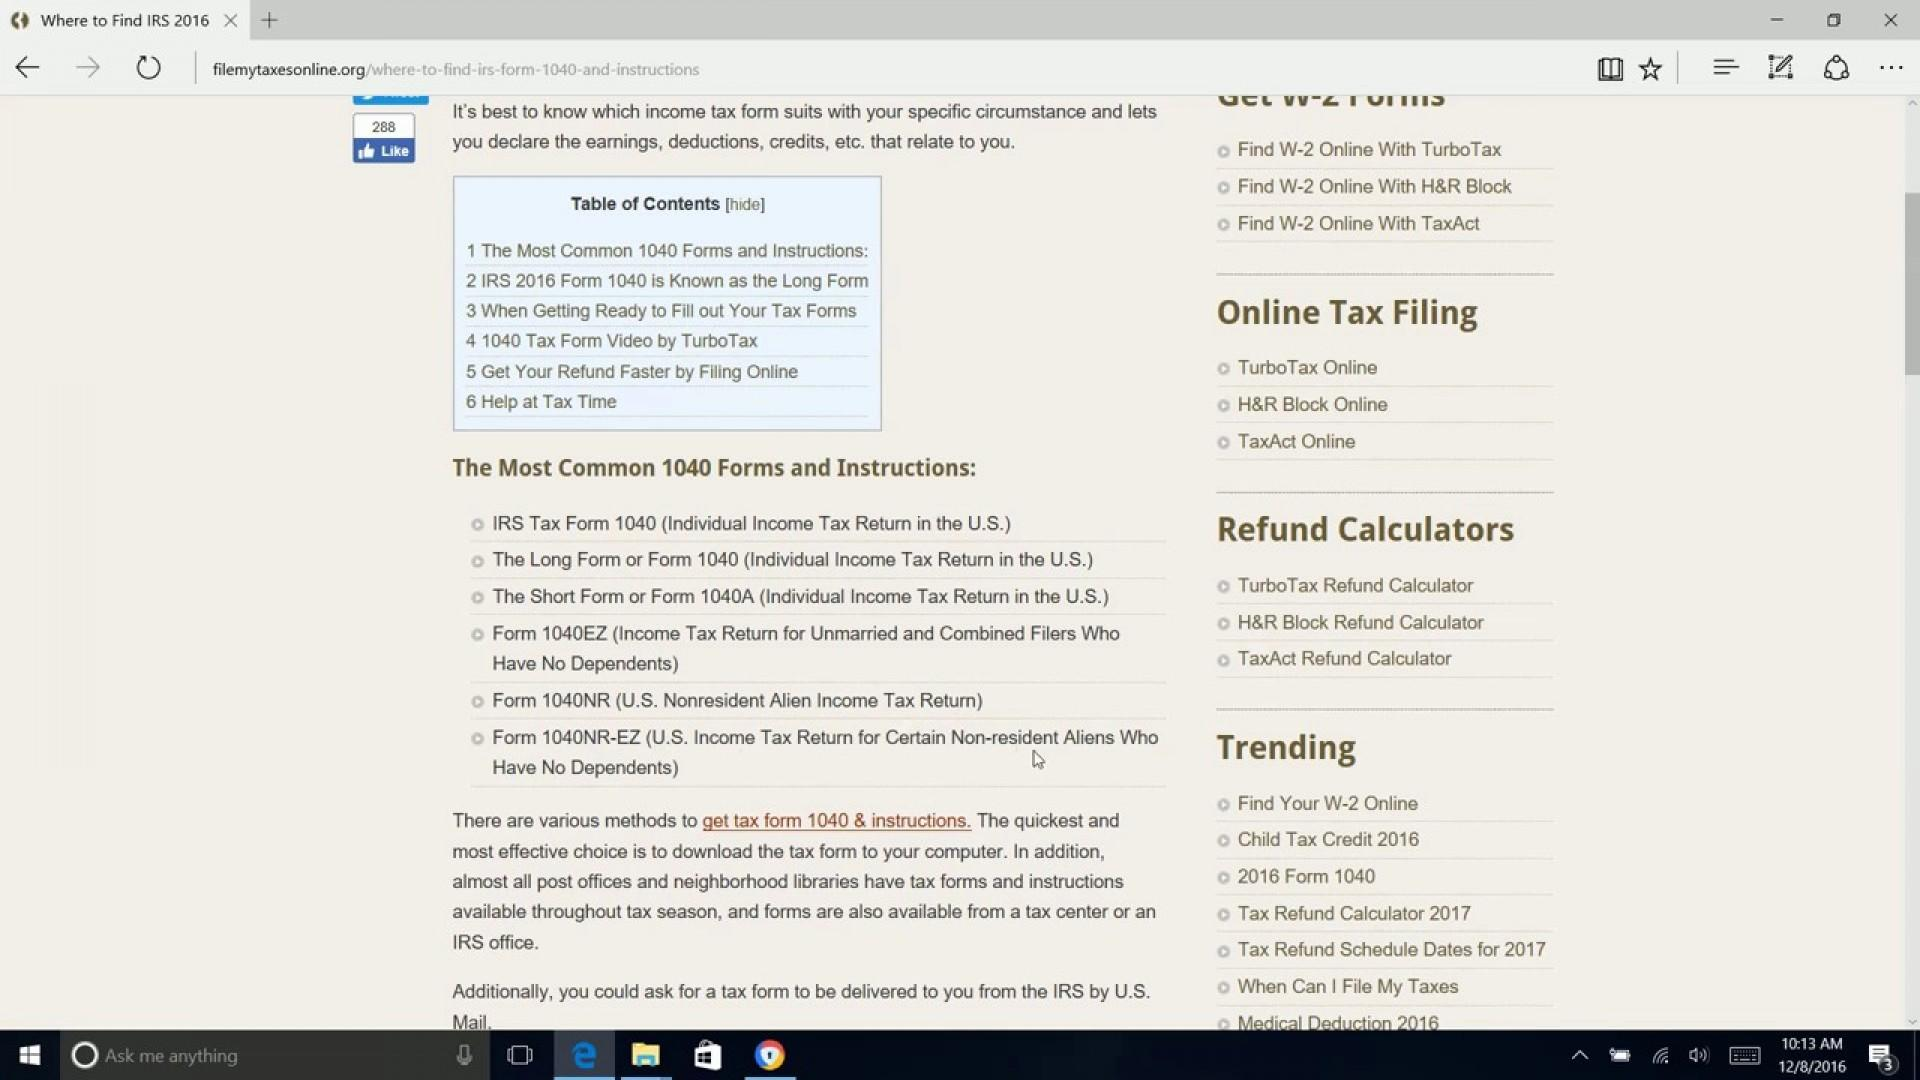 Irs Tax Form 1040ez 2015 Instructions